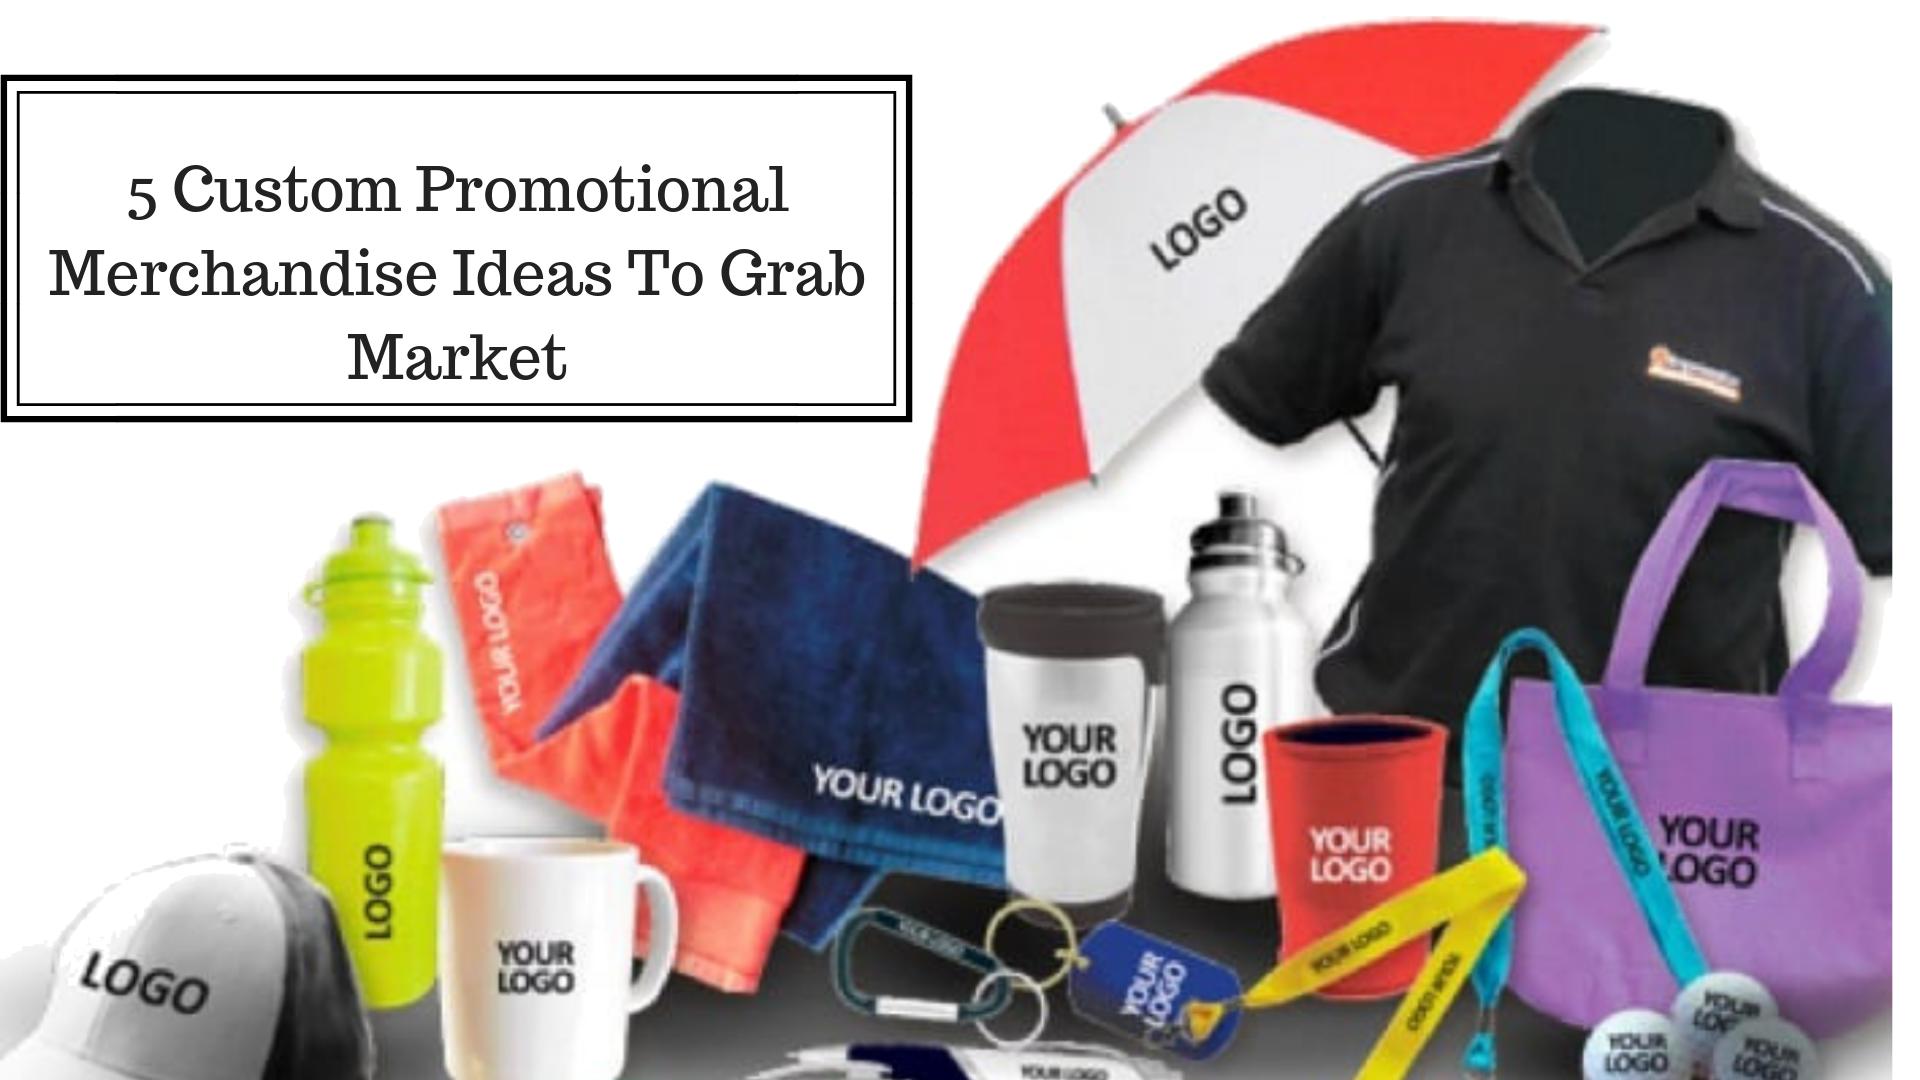 5 Custom Promotional Merchandise Ideas To Grab Market